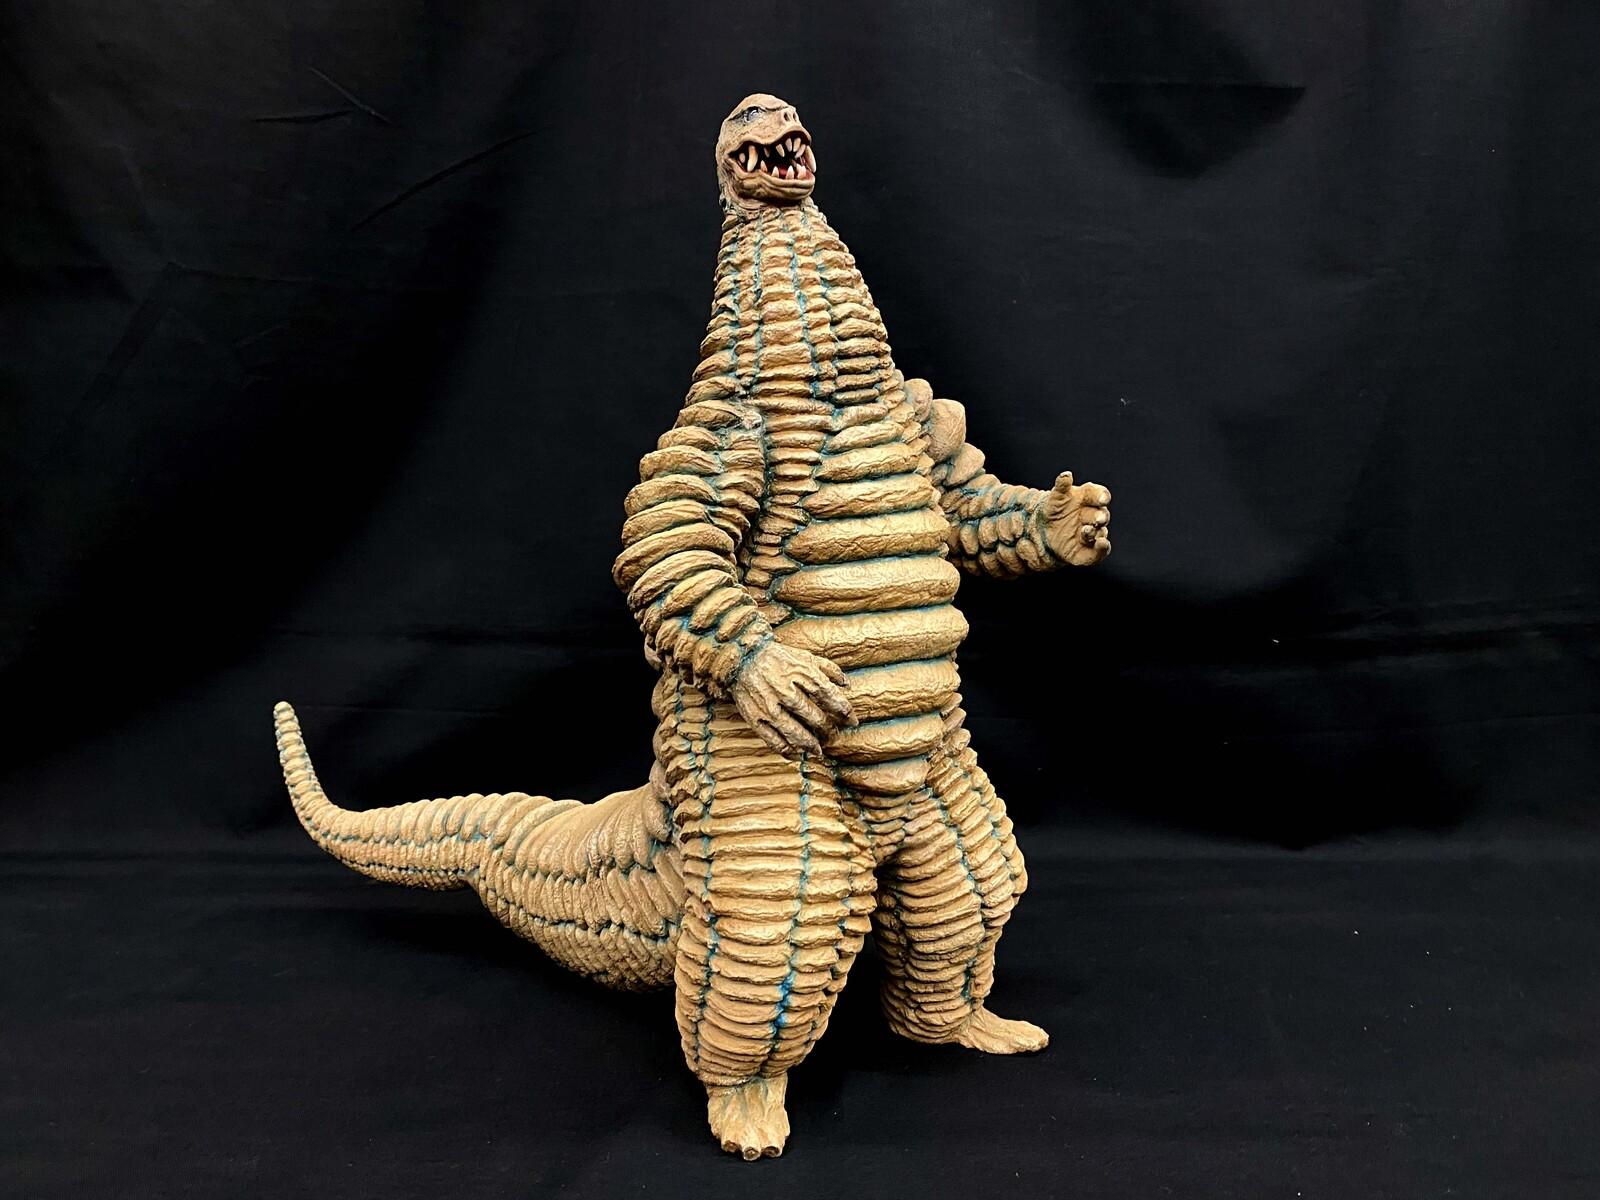 Ultra Kaiju Red King Art Statue どくろ怪獣レッドキング 完成品 https://www.solidart.club/